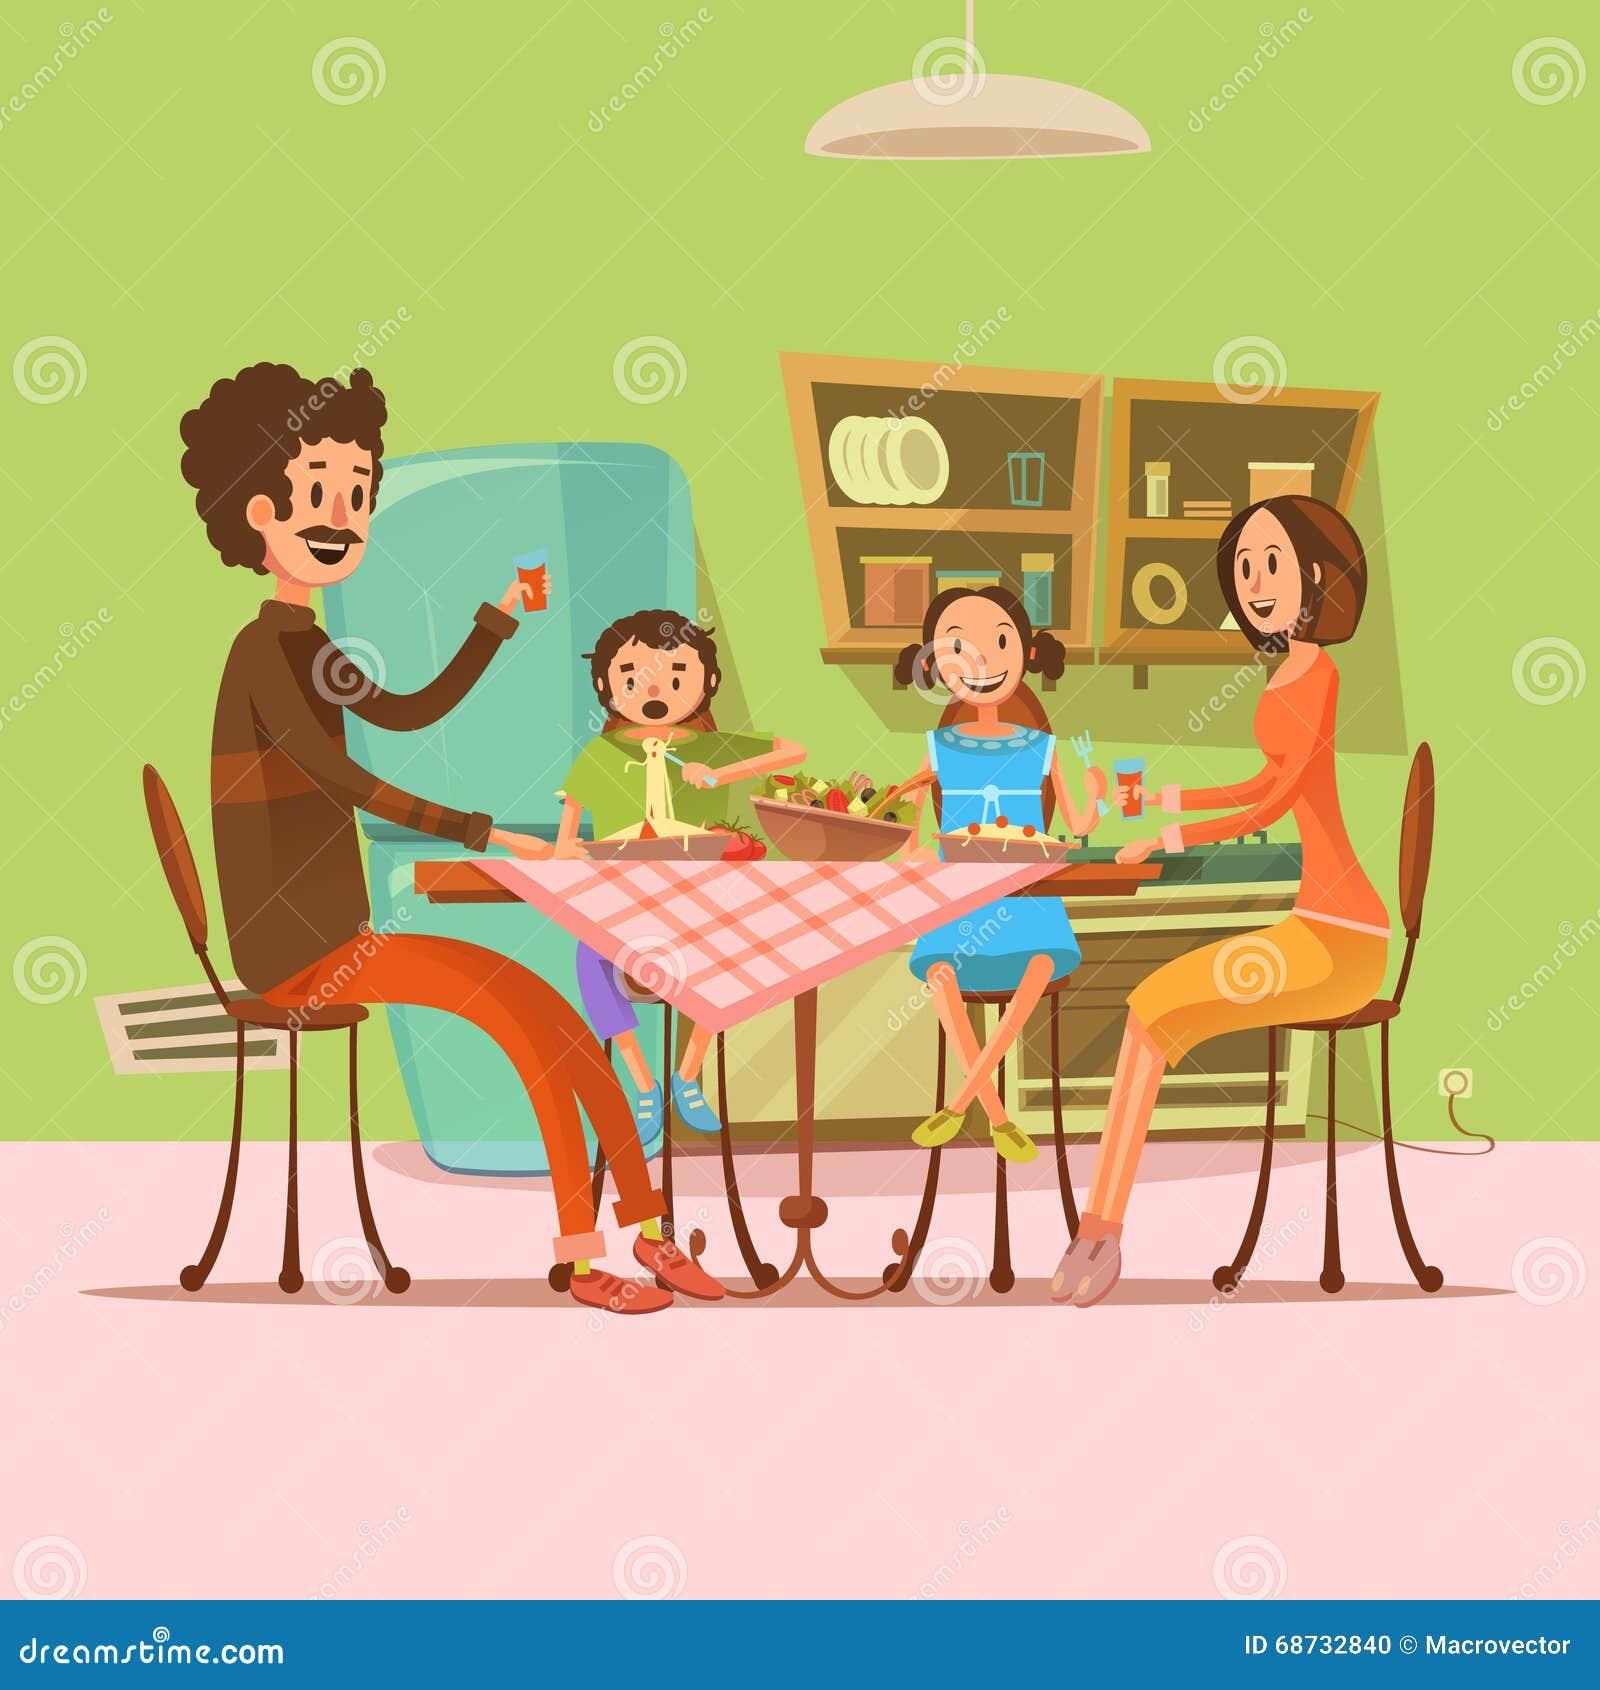 Eating Table Cartoon: Family Having Meal Illustration Stock Vector